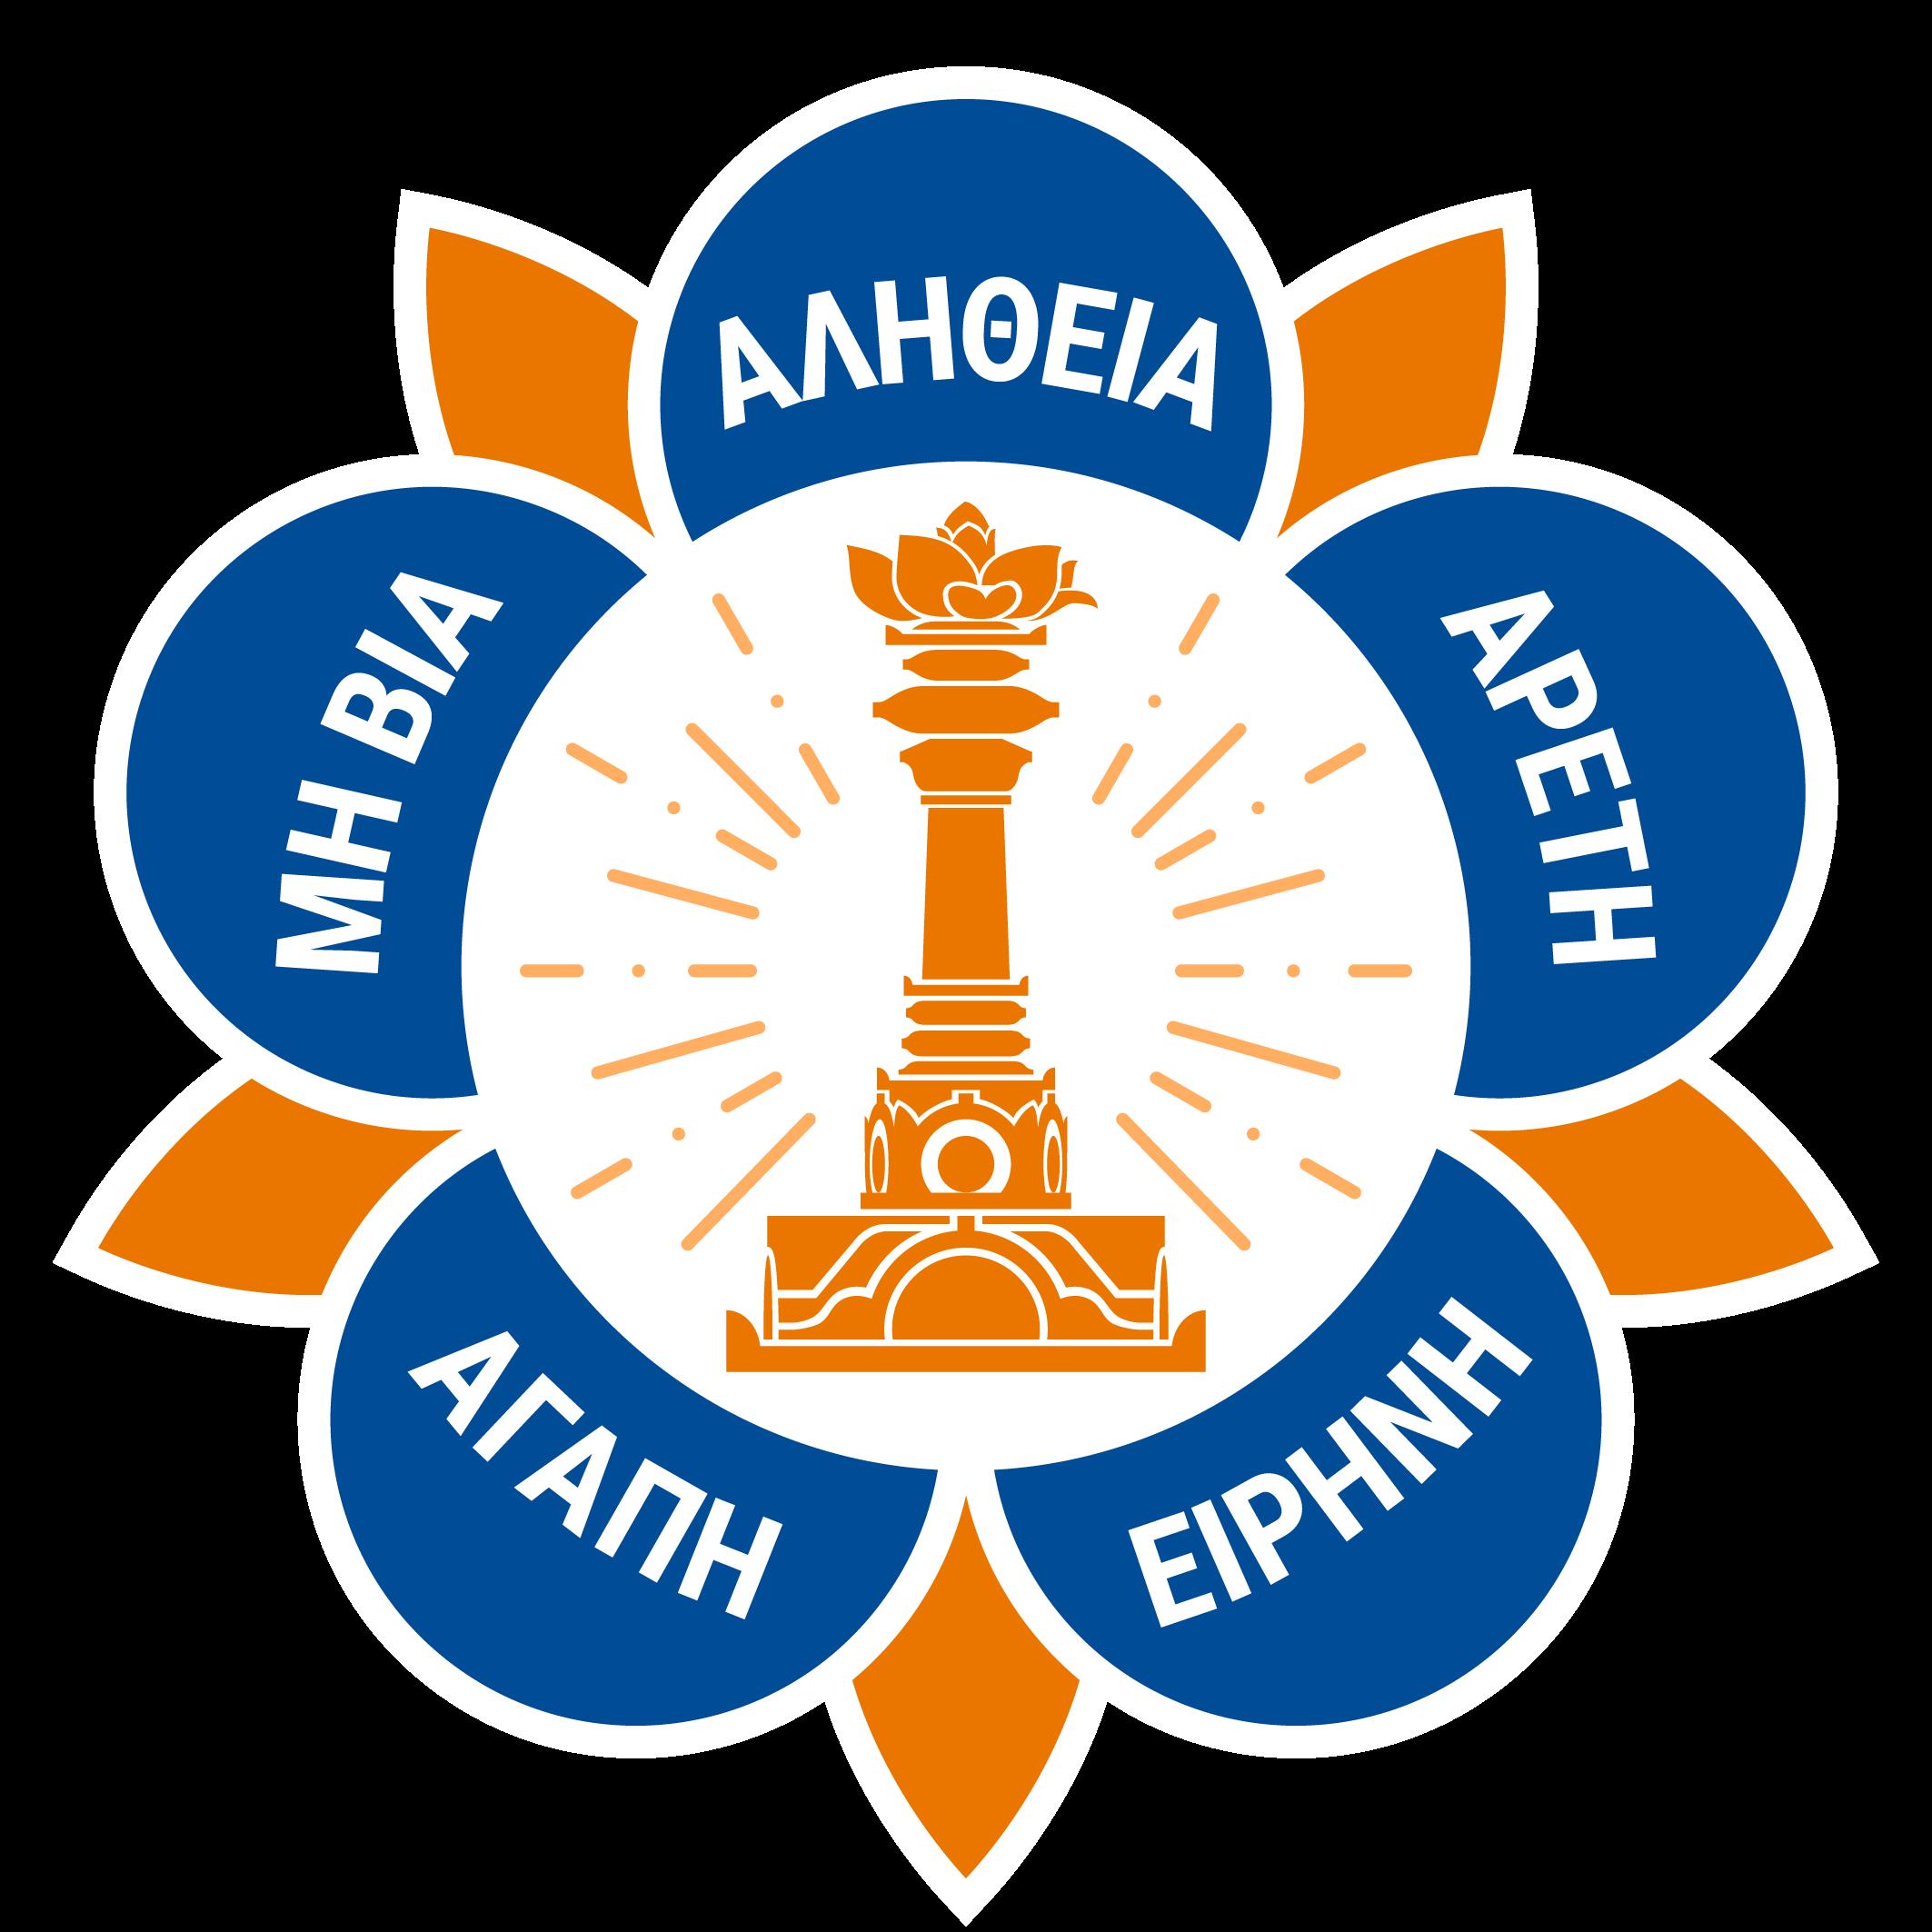 Logo of the sathya sai international organisation sathya sai greekhebrewhungarian biocorpaavc Image collections